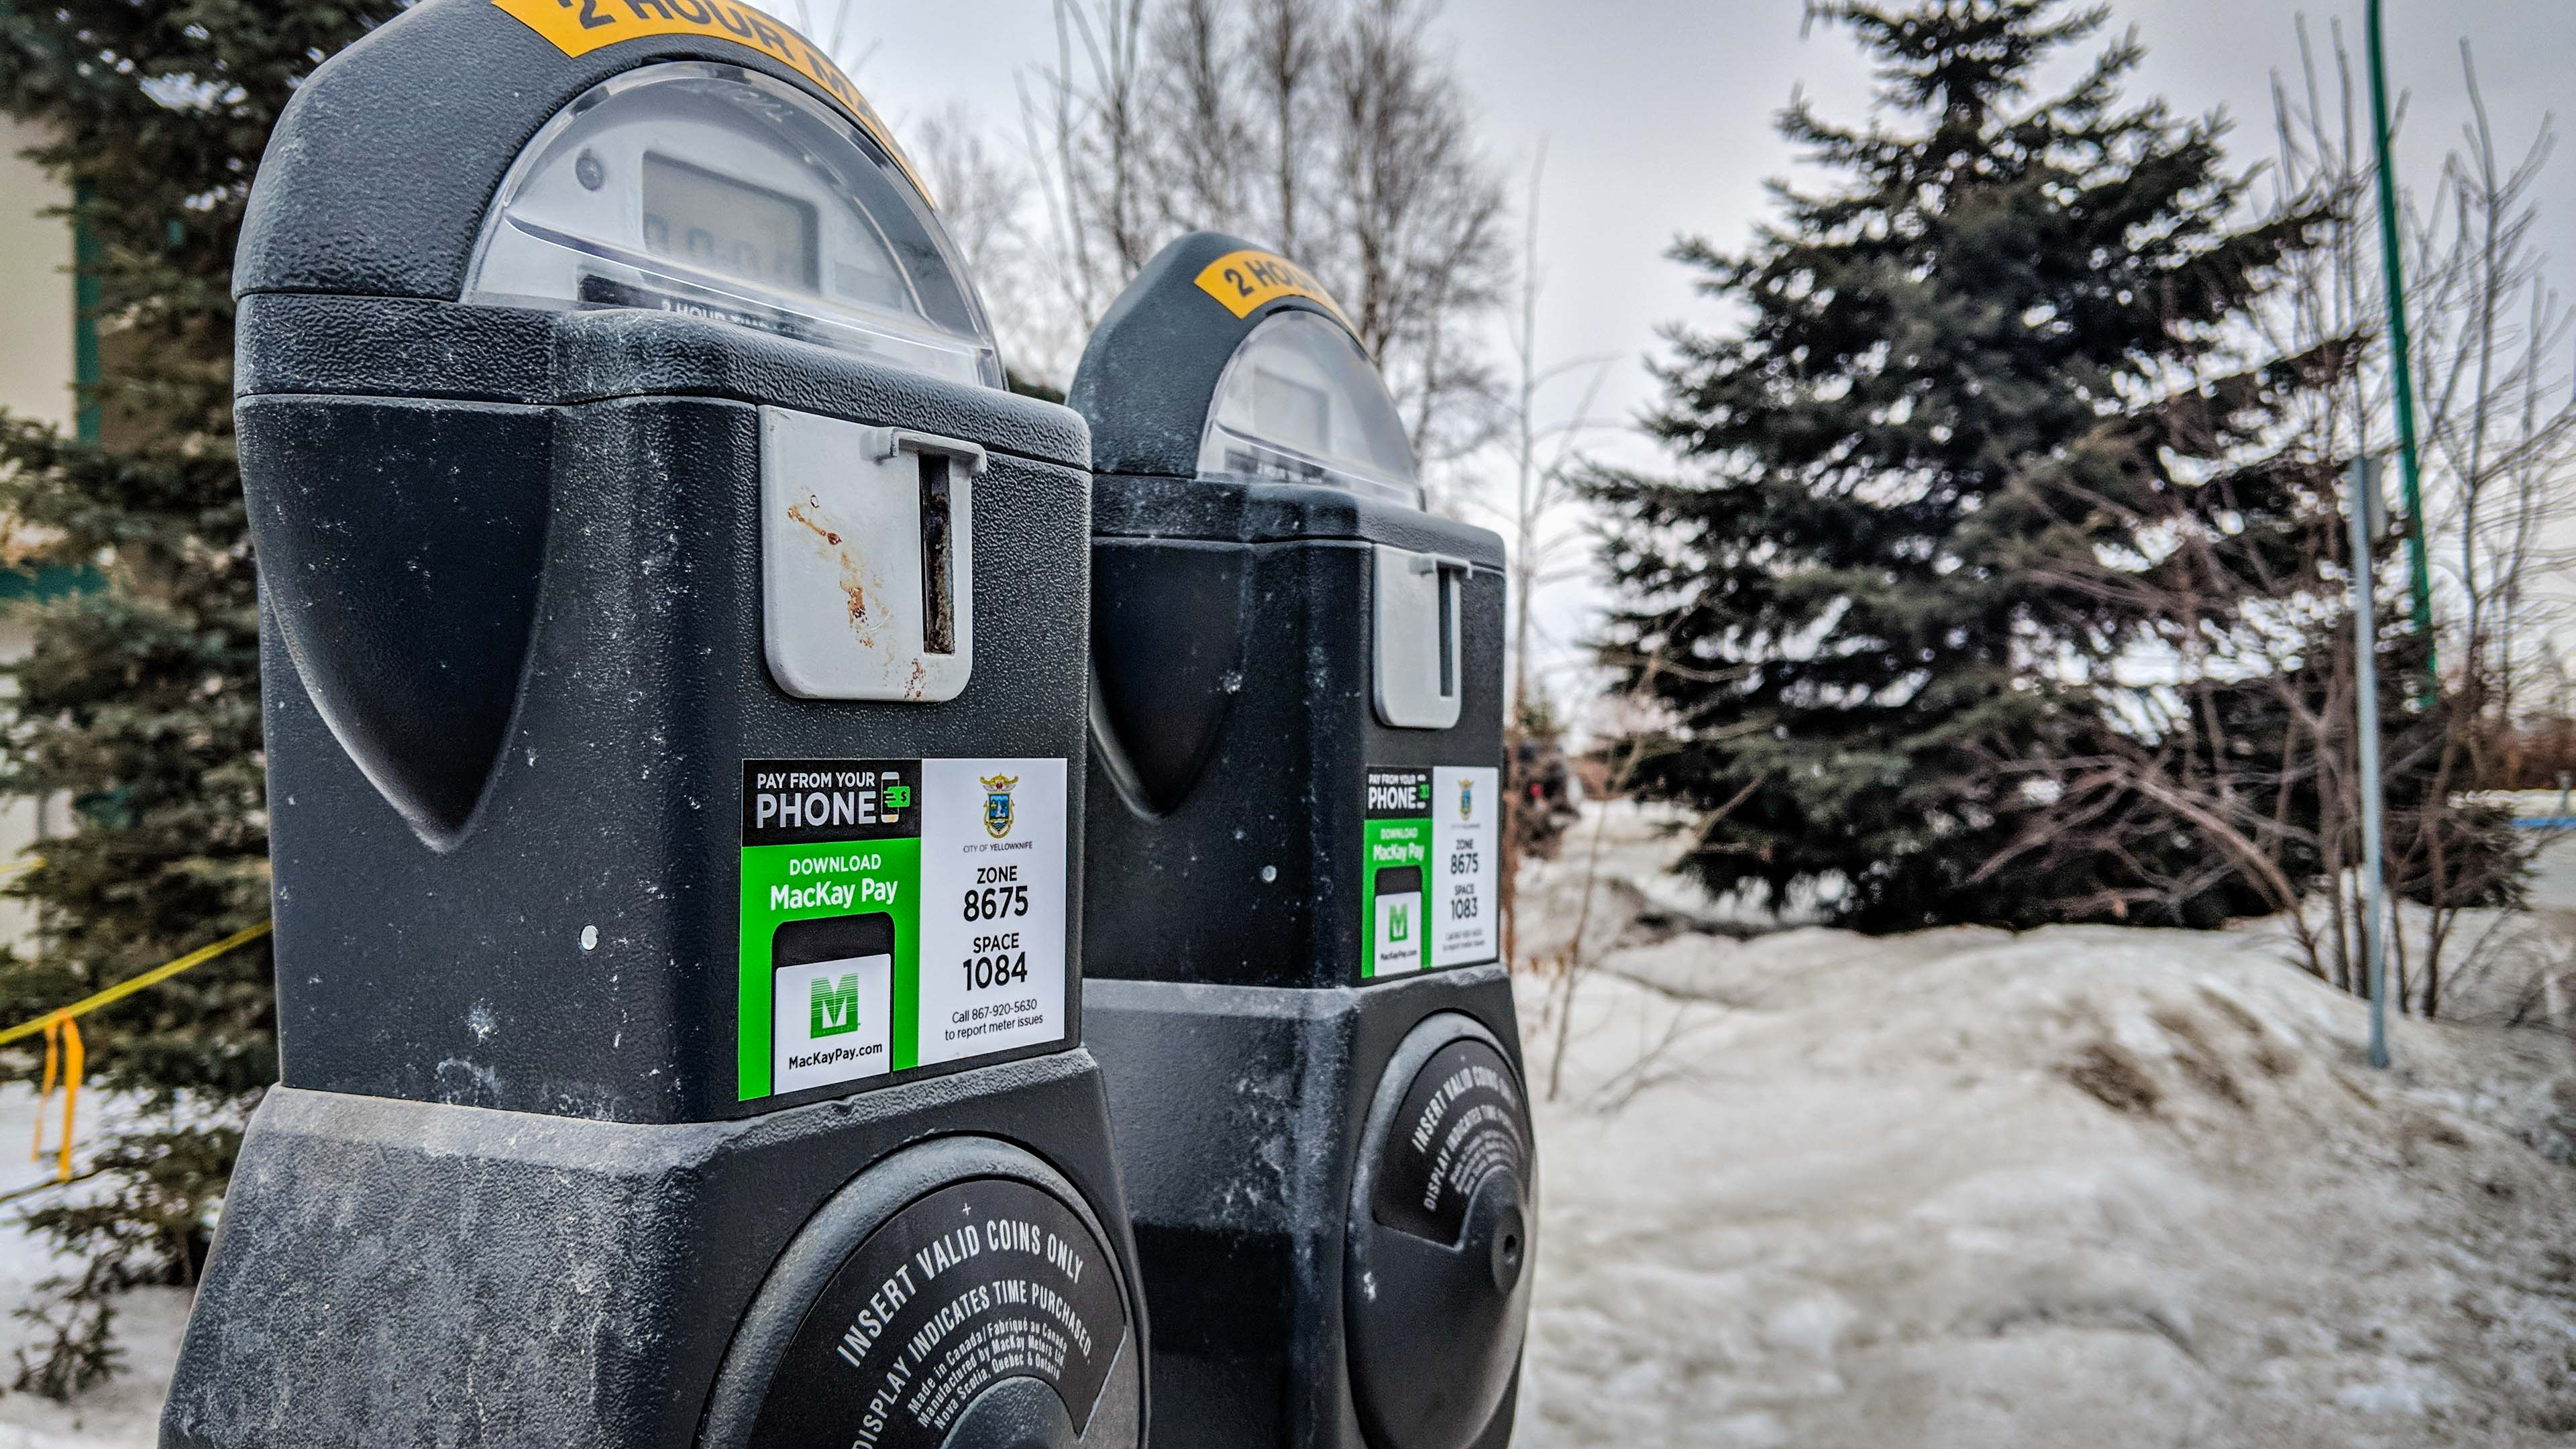 Parking meters in downtown Yellowknife